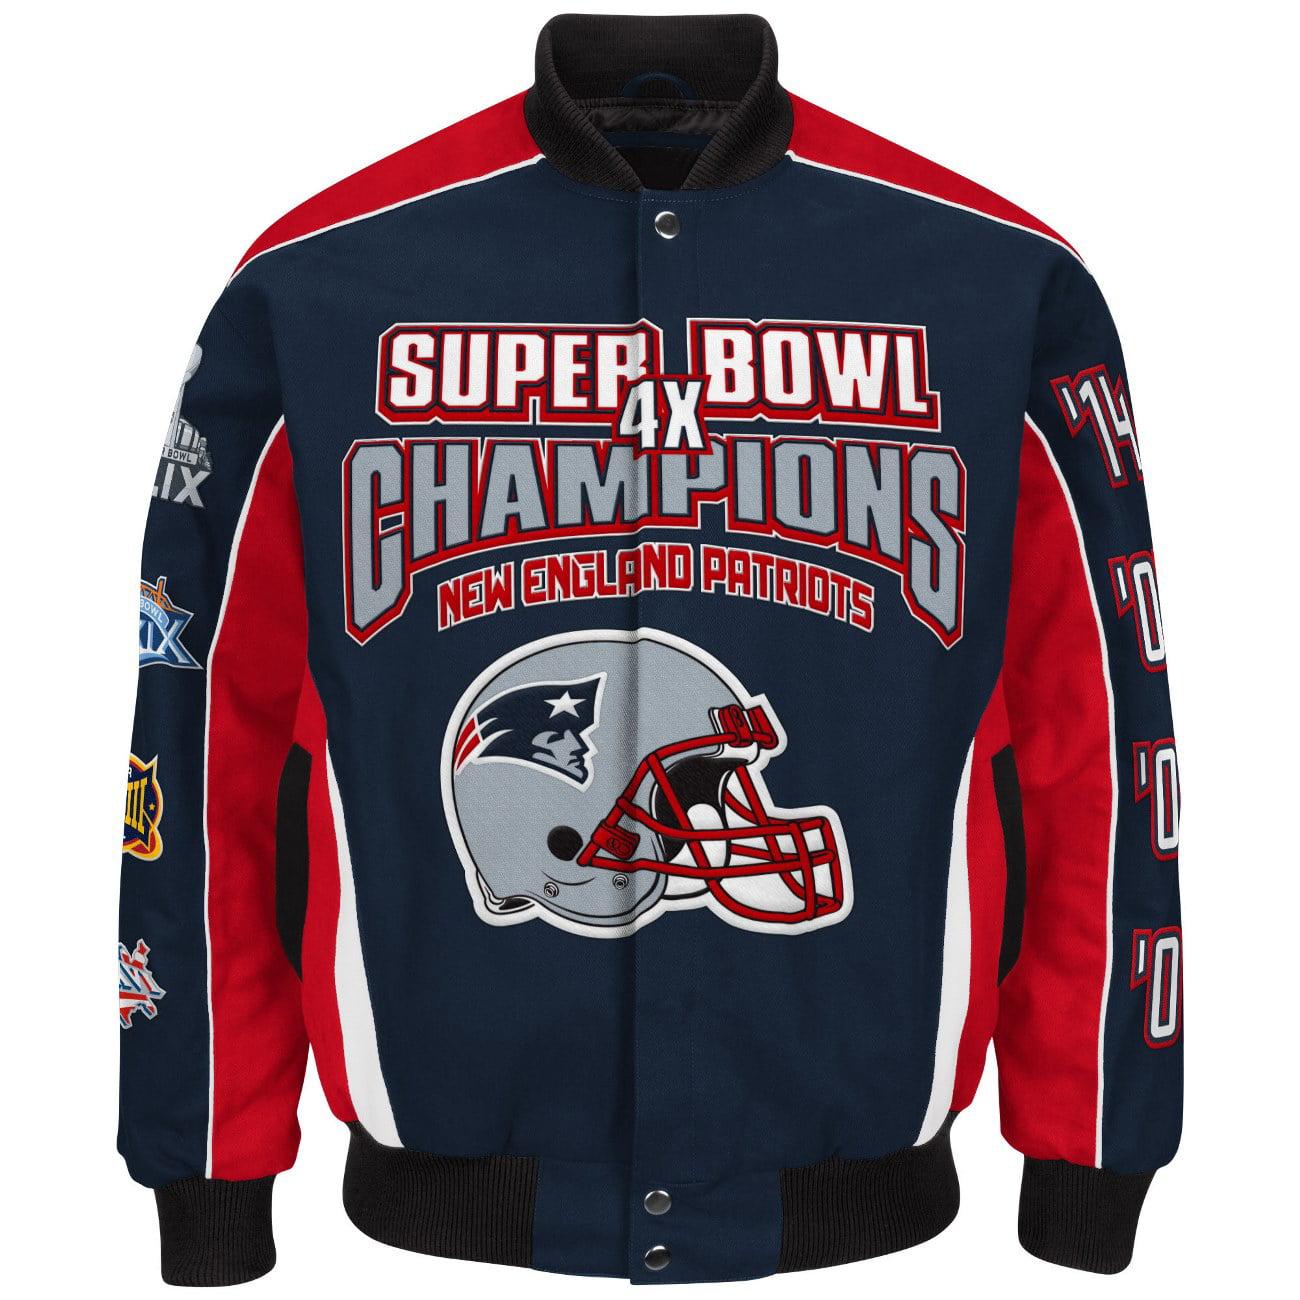 New England Patriots NFL G-III Super Bowl Cotton Twill Commemorative Jacket